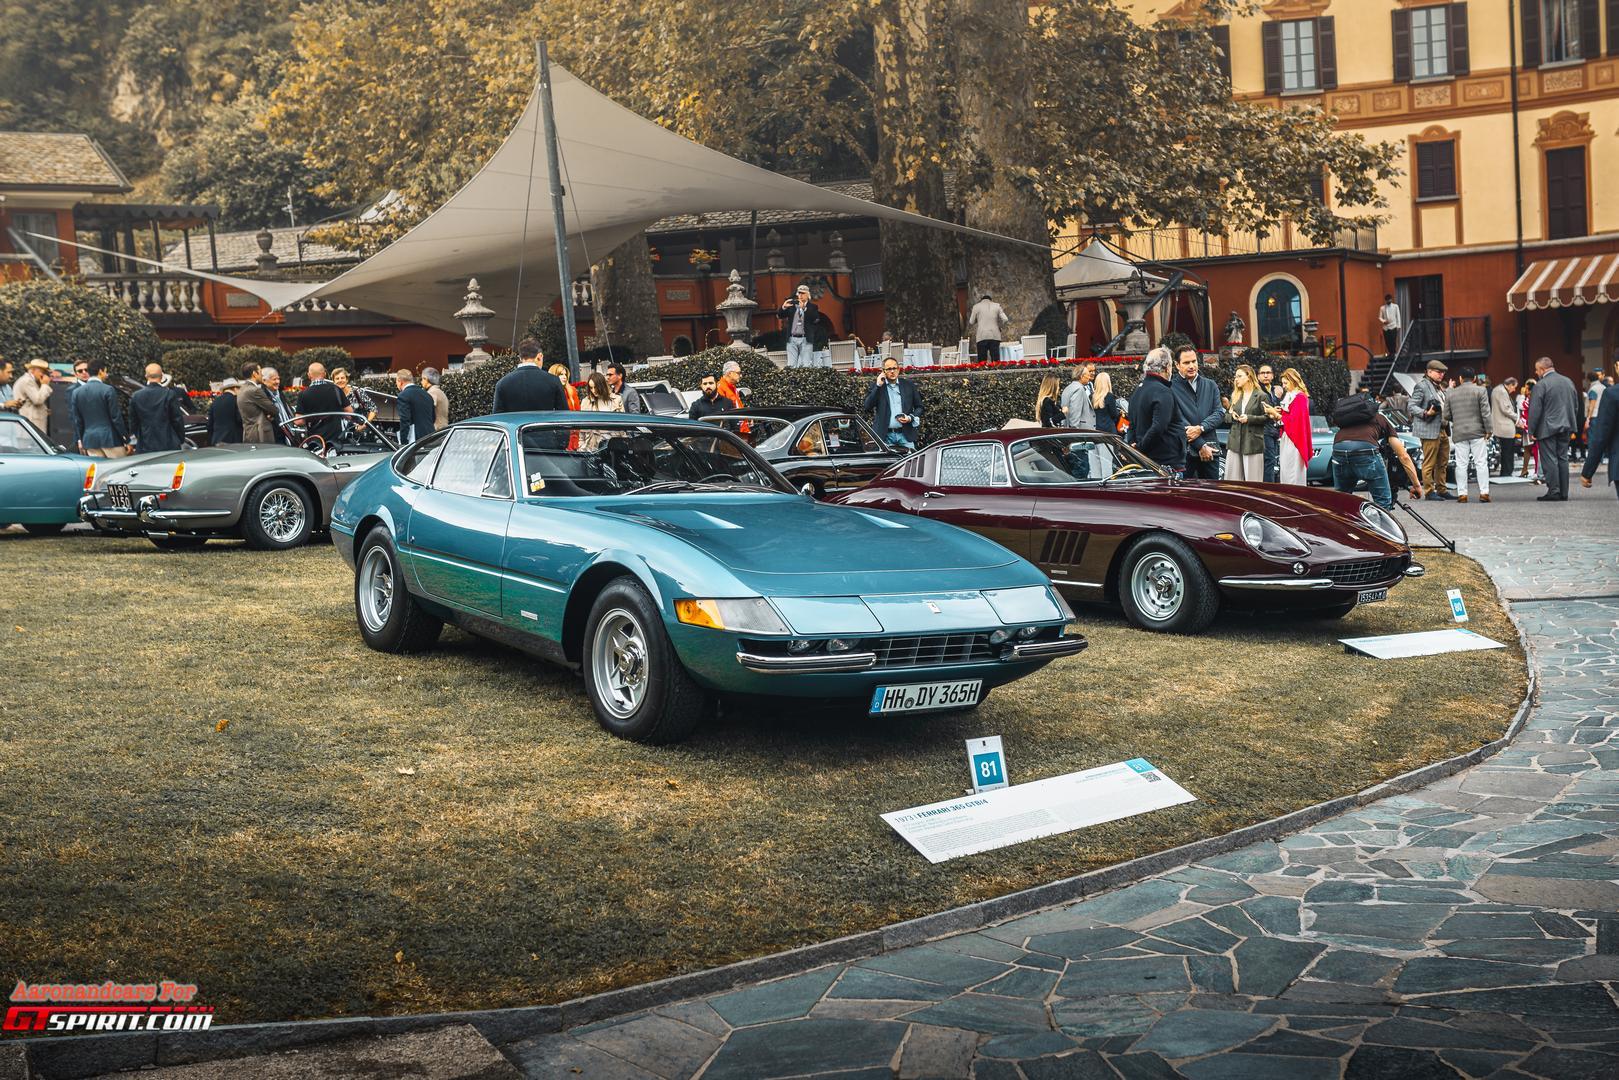 Classic Ferrari Daytona